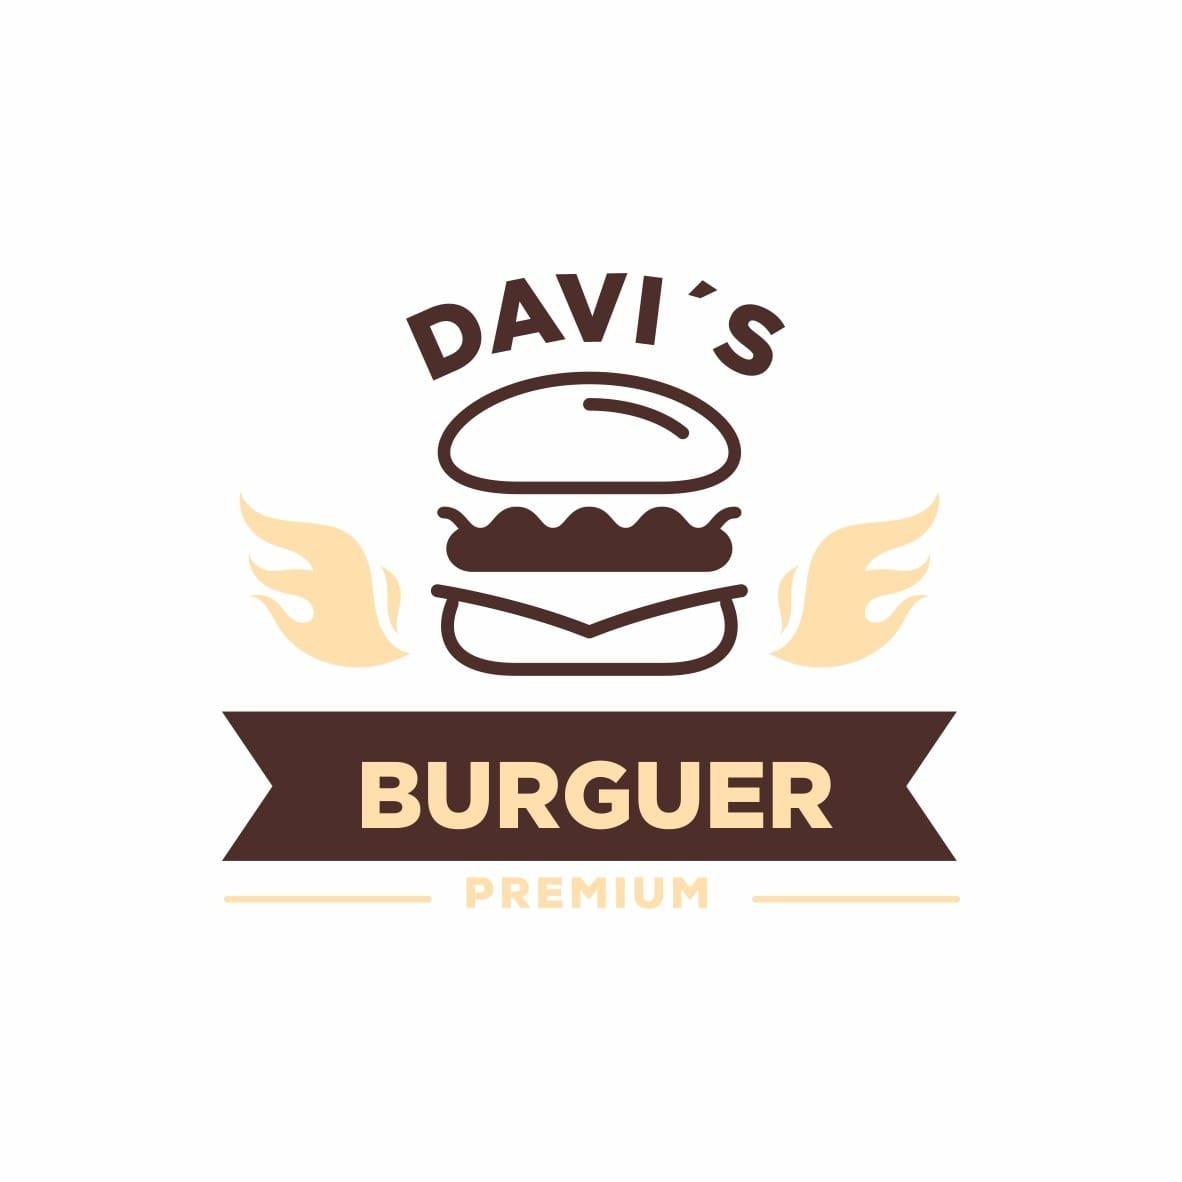 Davi's Burguer